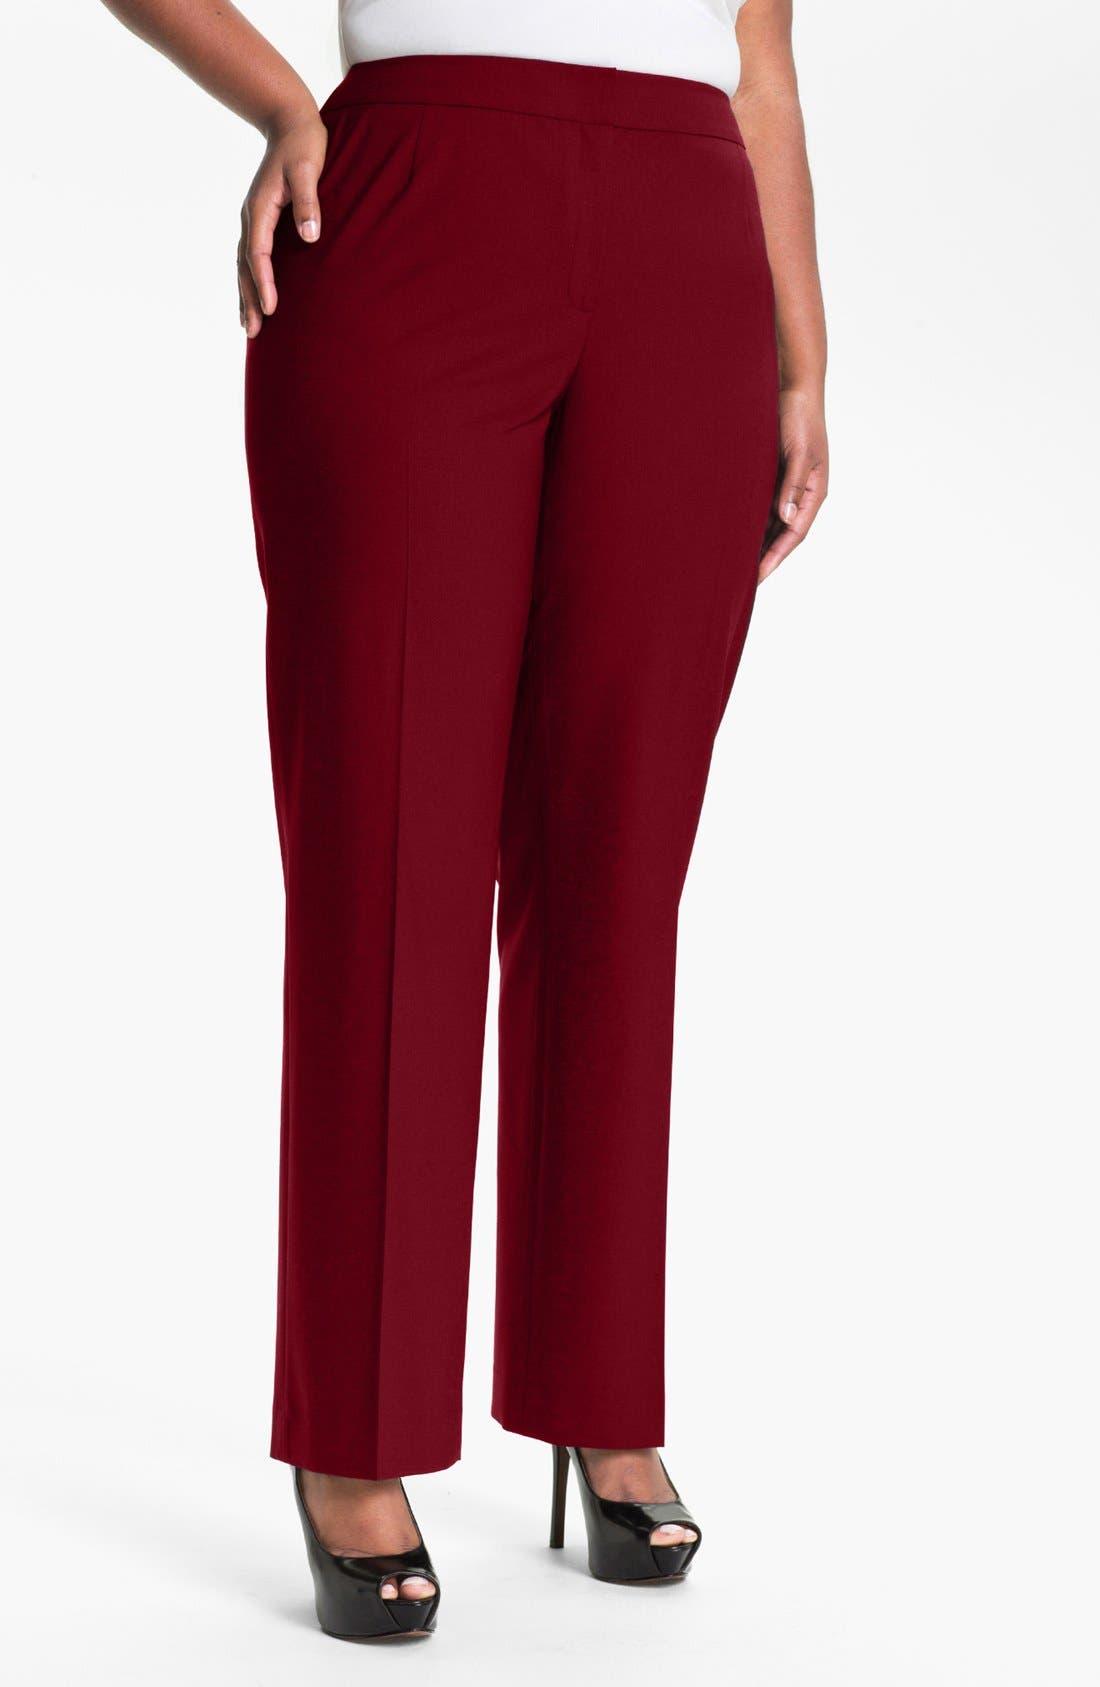 Alternate Image 1 Selected - Lafayette 148 New York 'Menswear' Trousers (Plus Size)